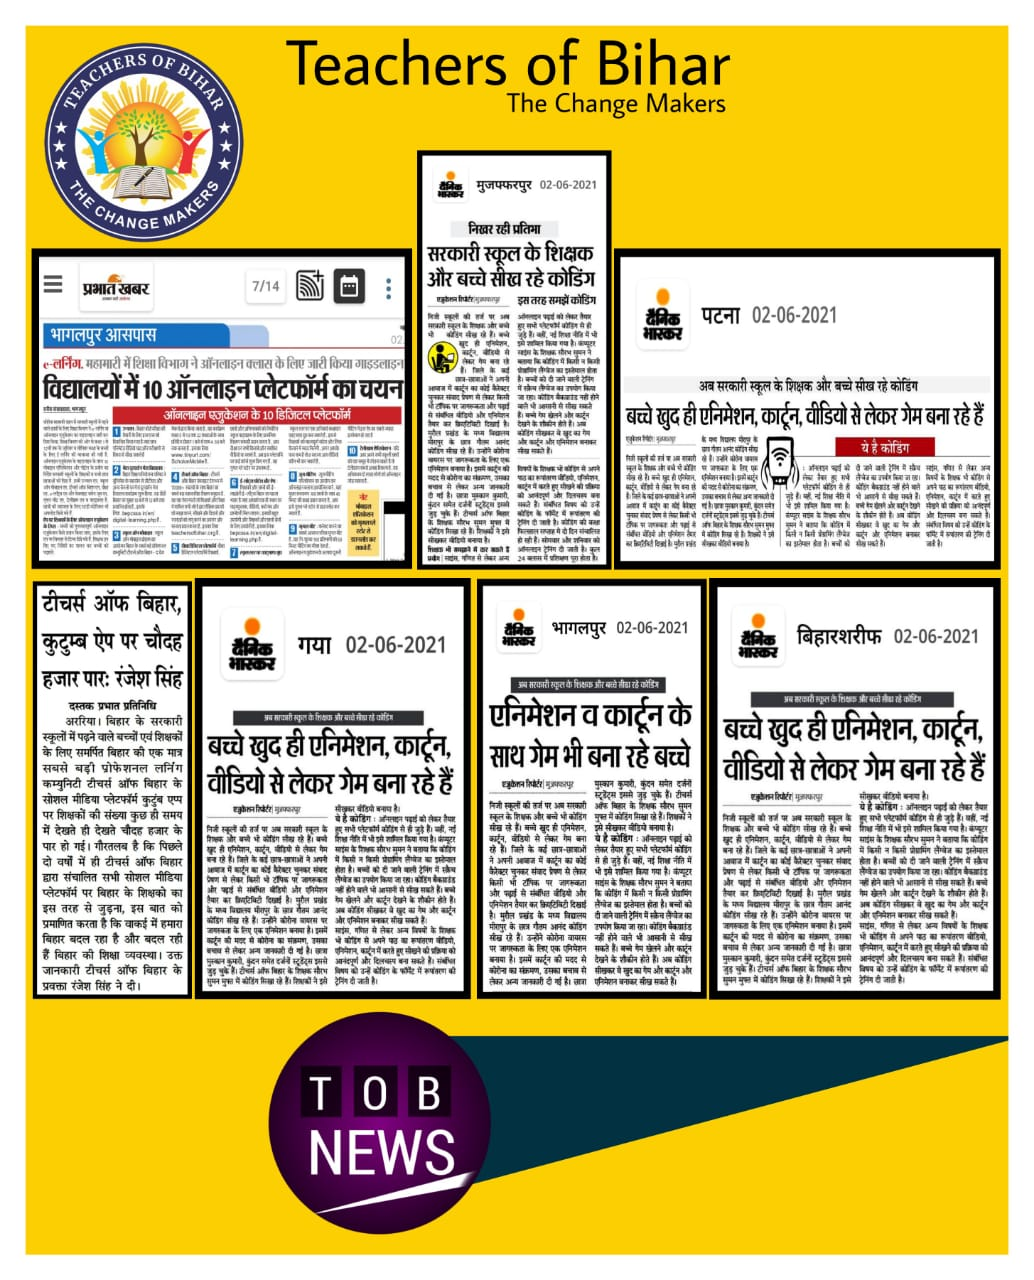 Teachers of Bihar , 02.06.2021